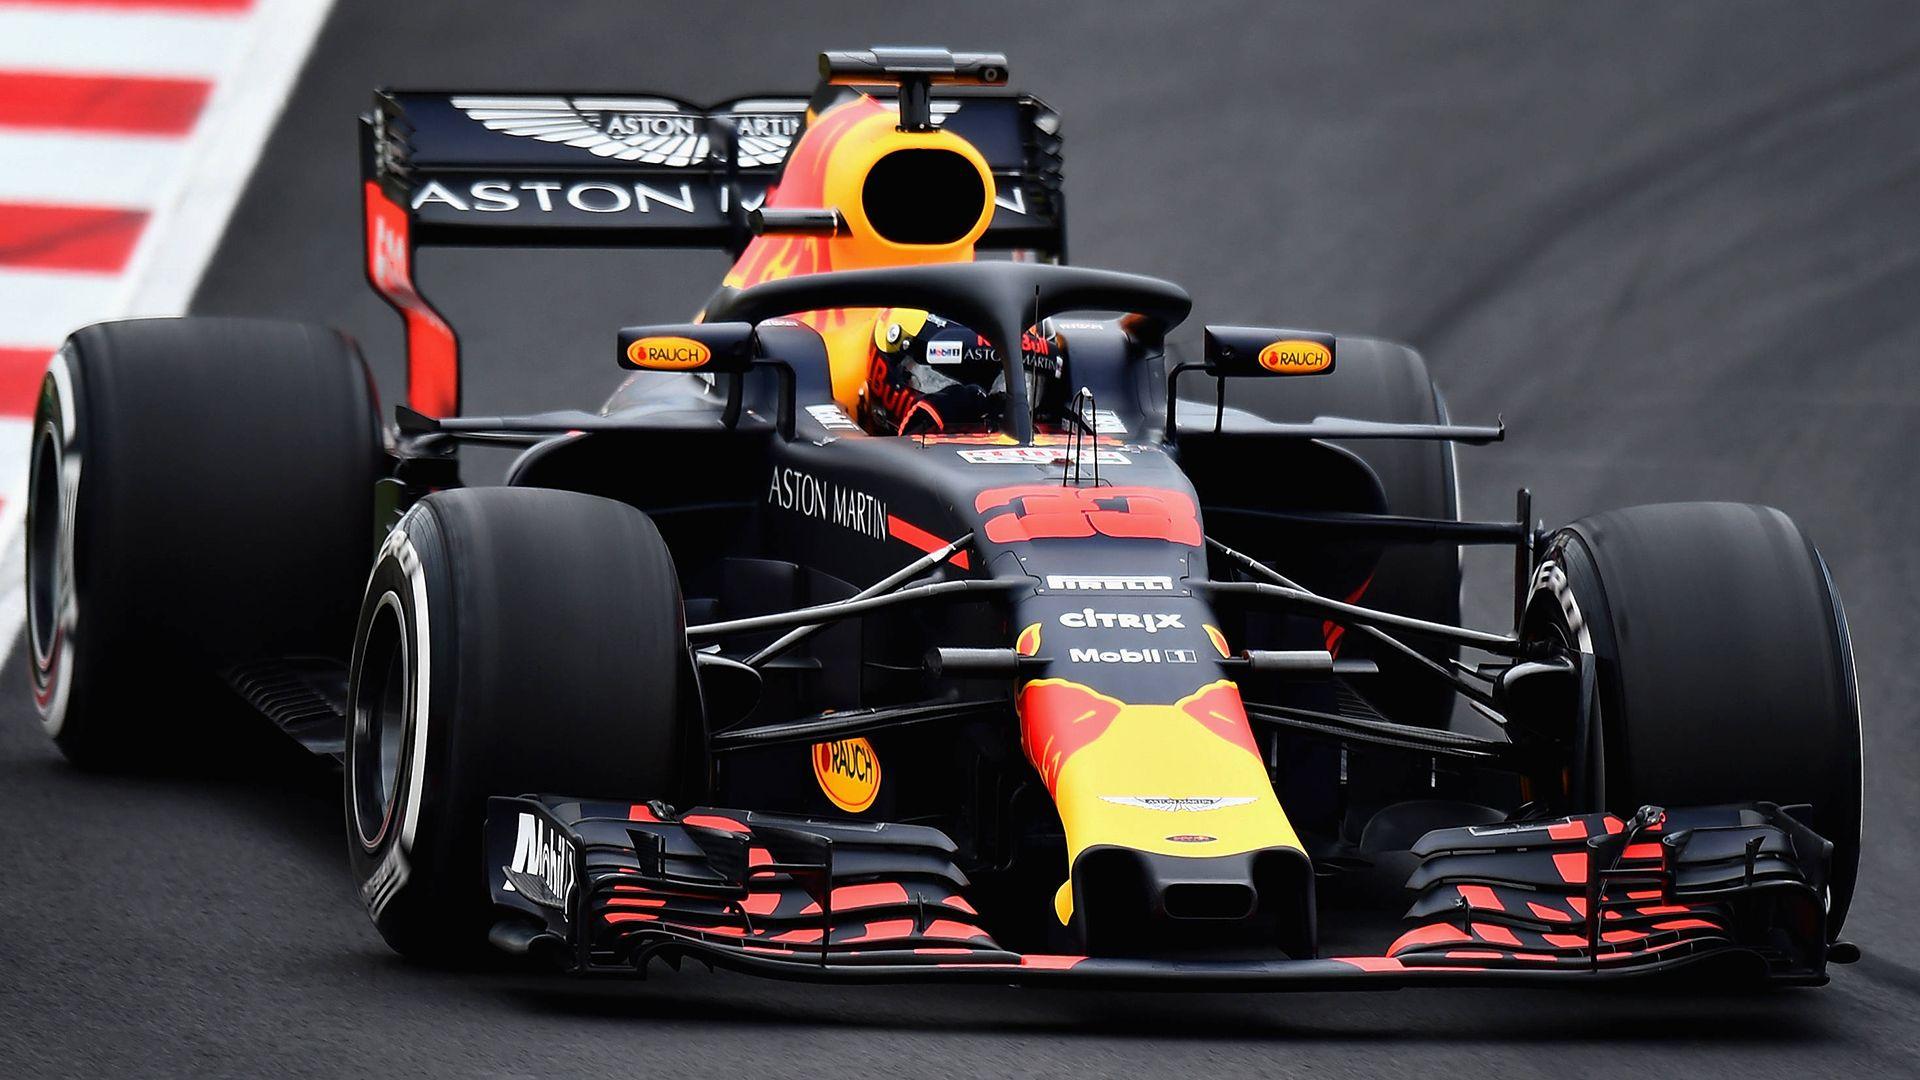 Max Verstappen Wintertest Rb14 Barcelona 27 02 2018 Formula1